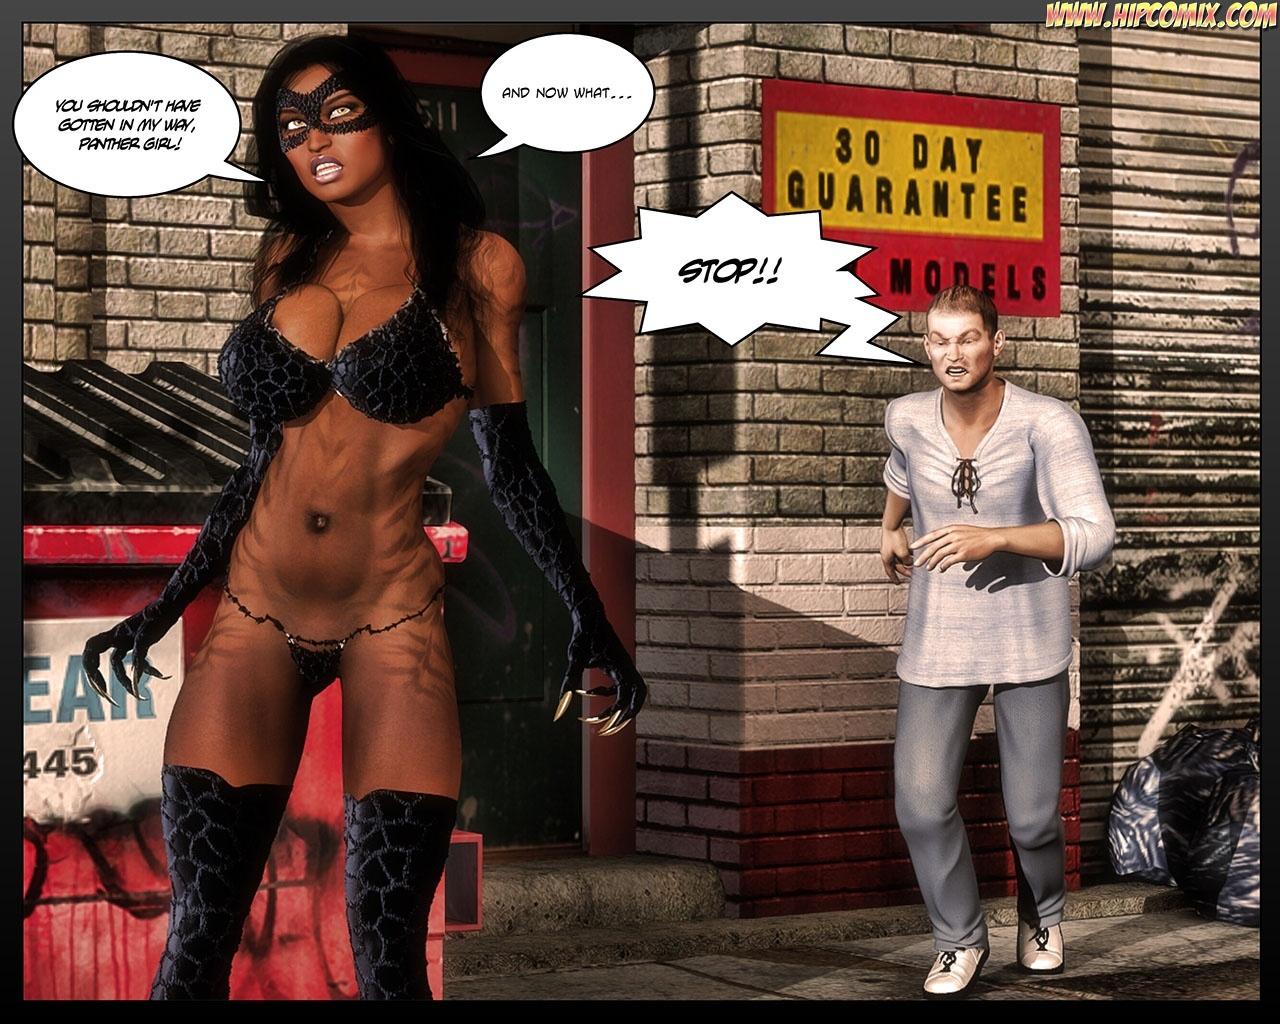 Panther-Girl-32 3 free sex comic